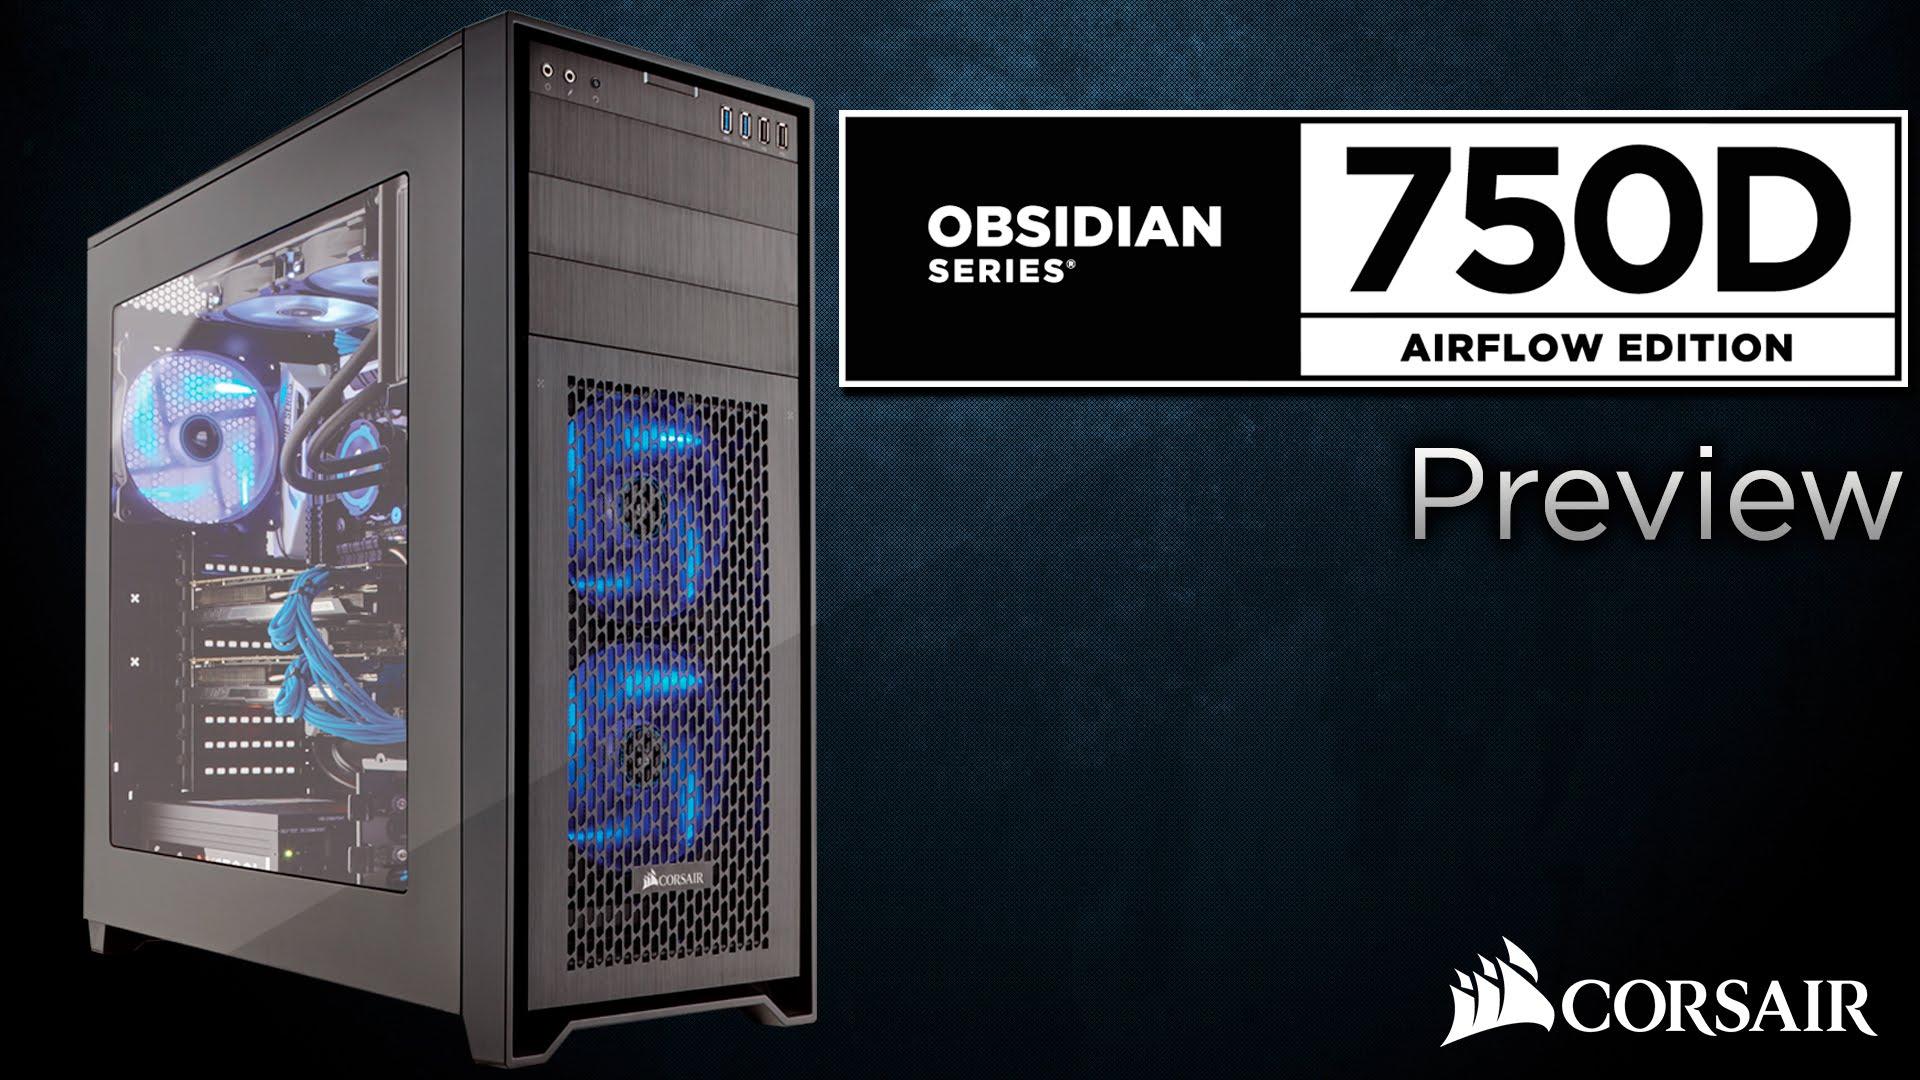 (Alternate) Corsair Obsidian 750D Airflow Edition